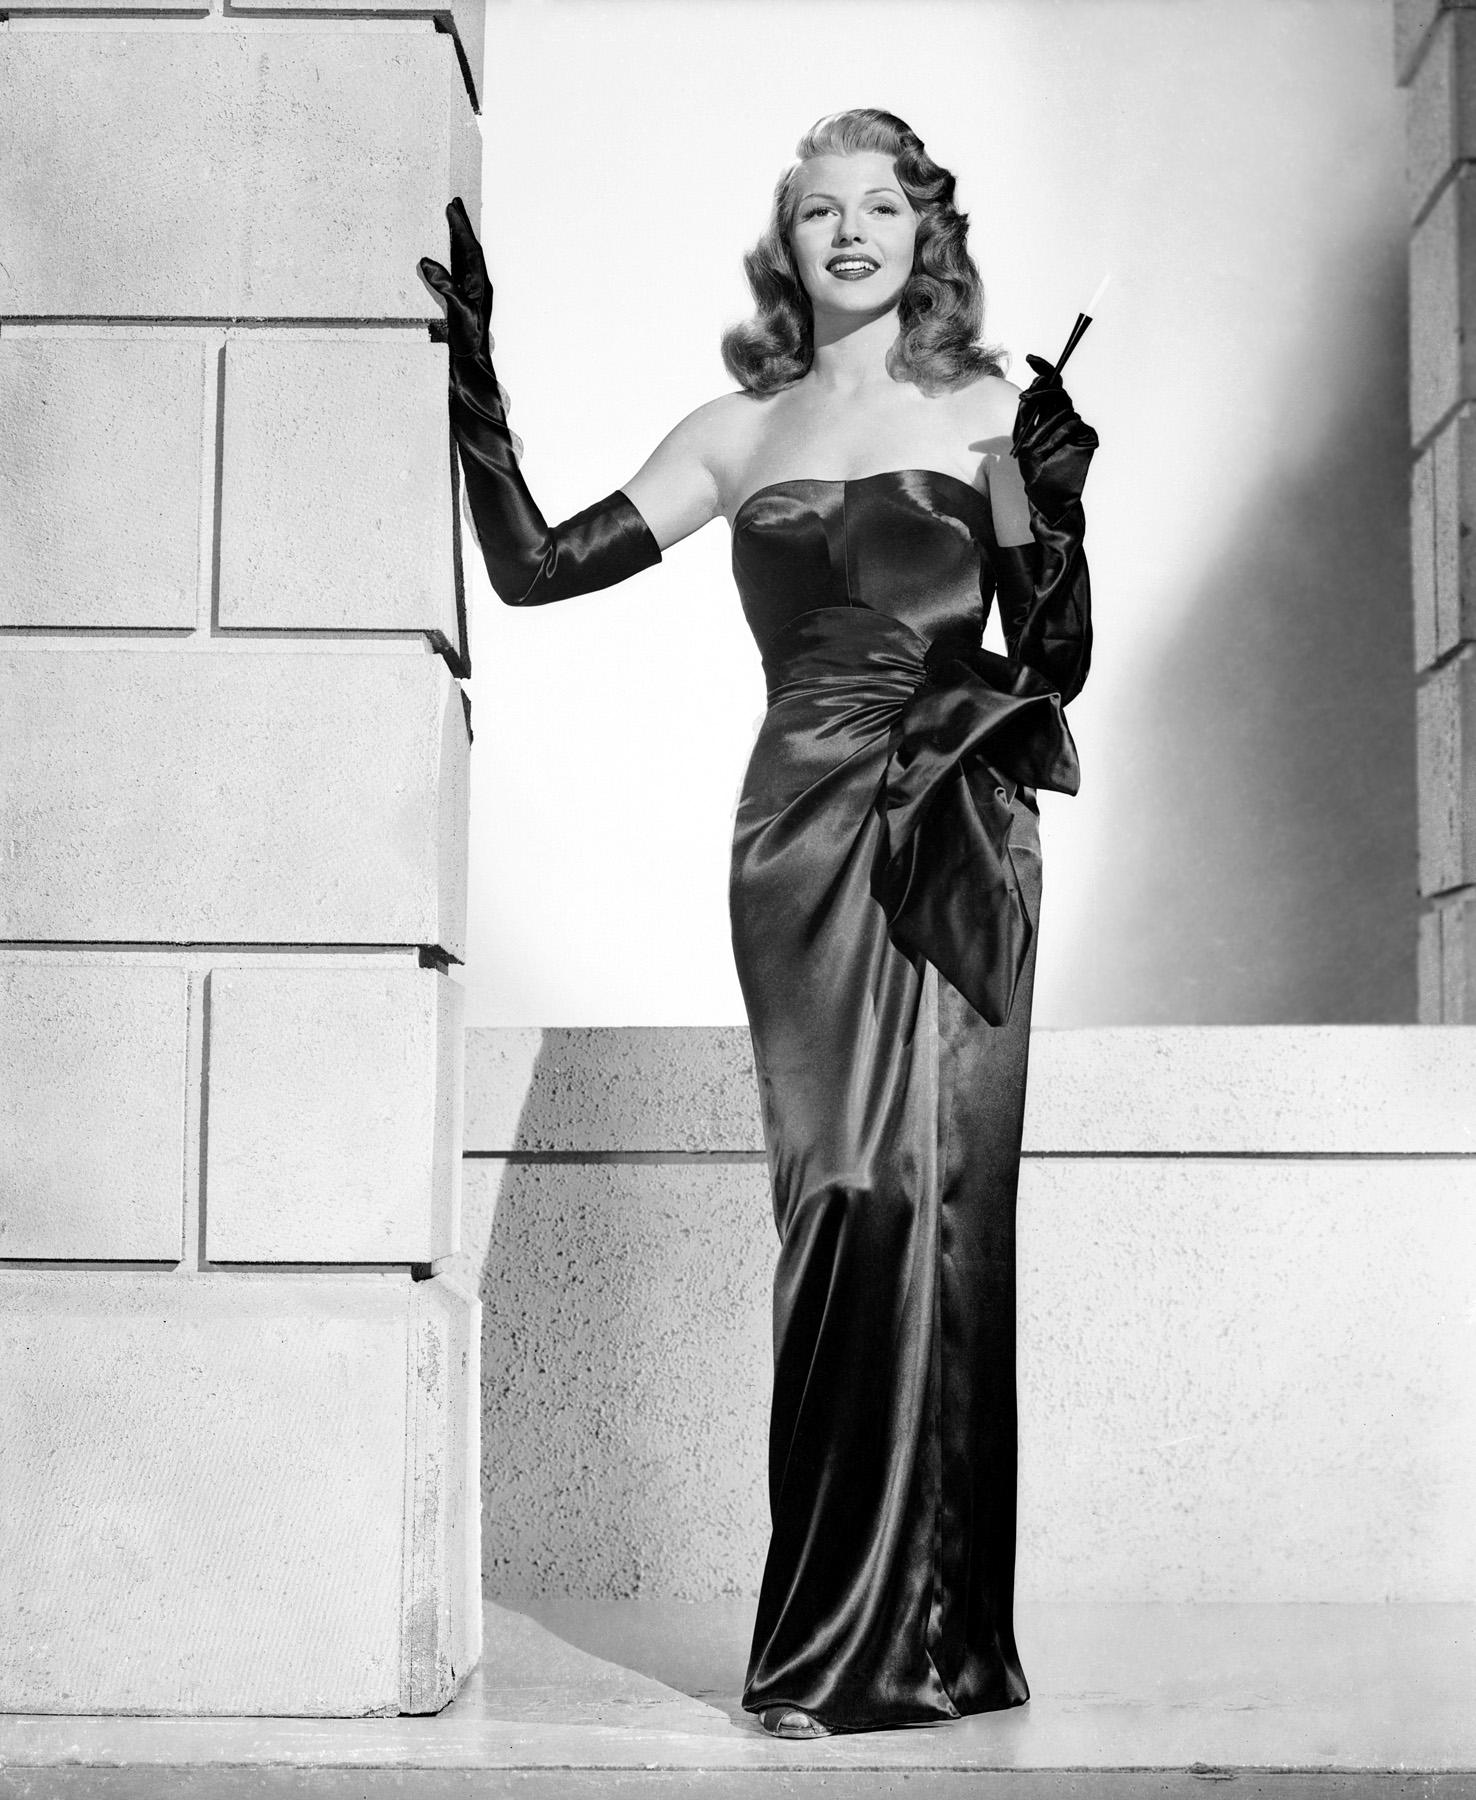 Evening dresses 1940s style